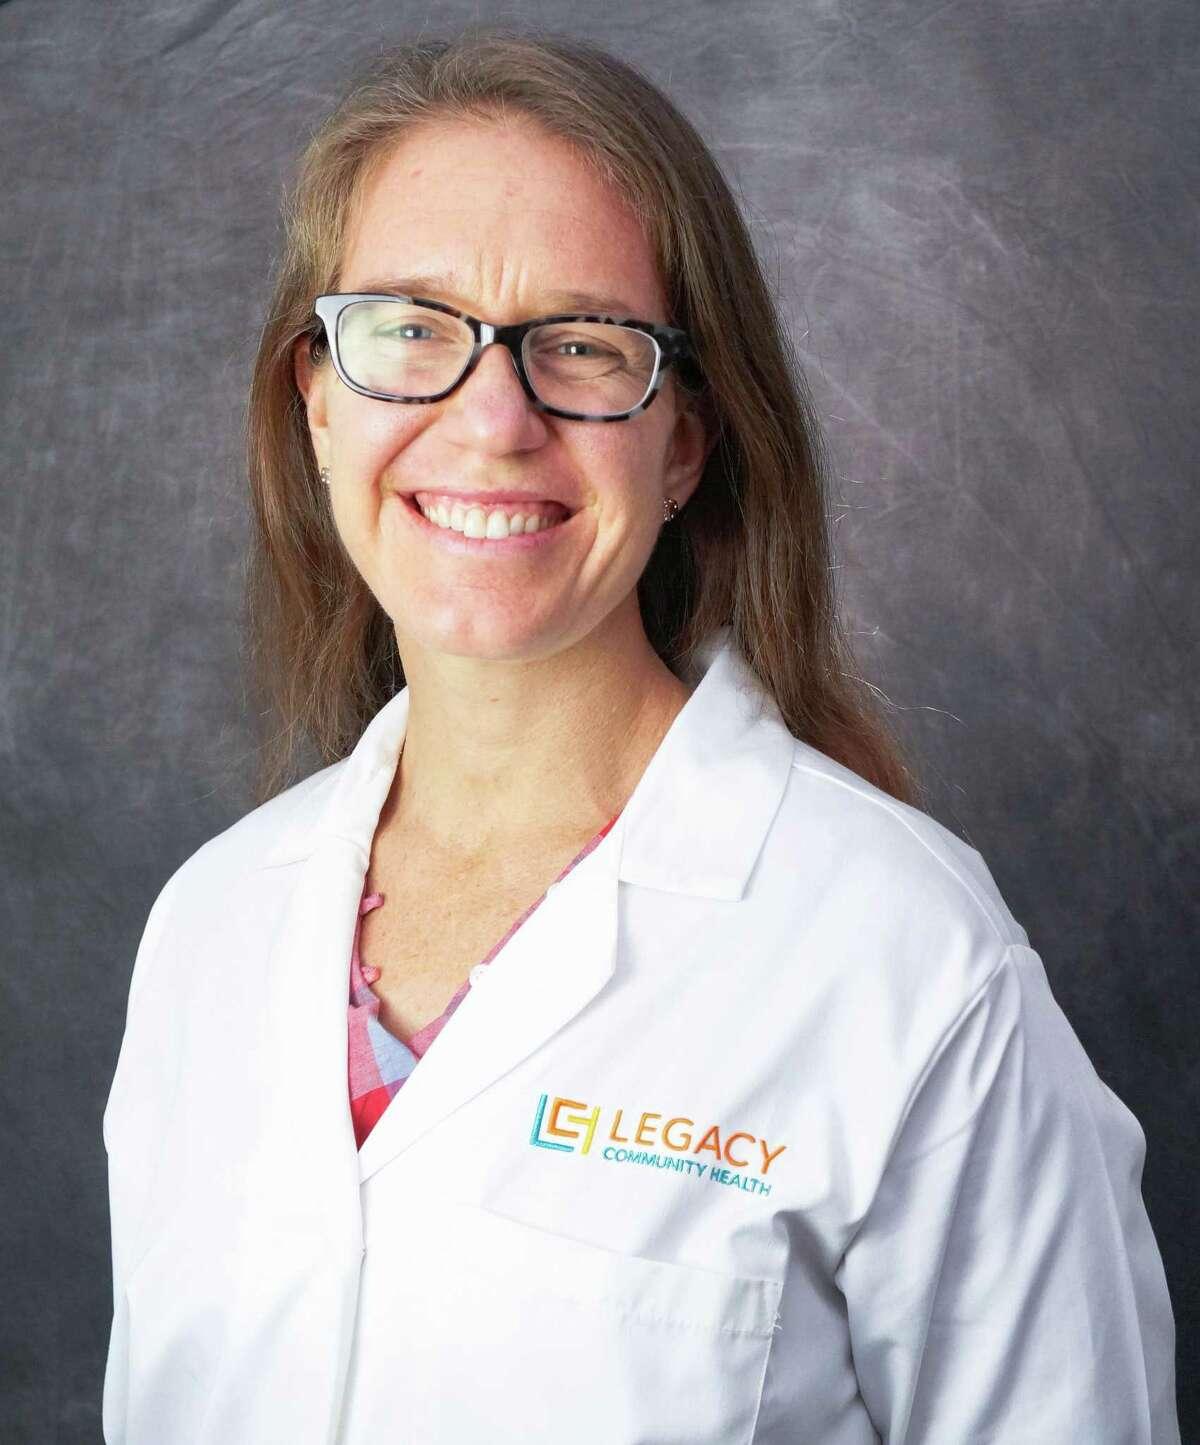 Dr. Amelia Averyt, Legacy Community Health